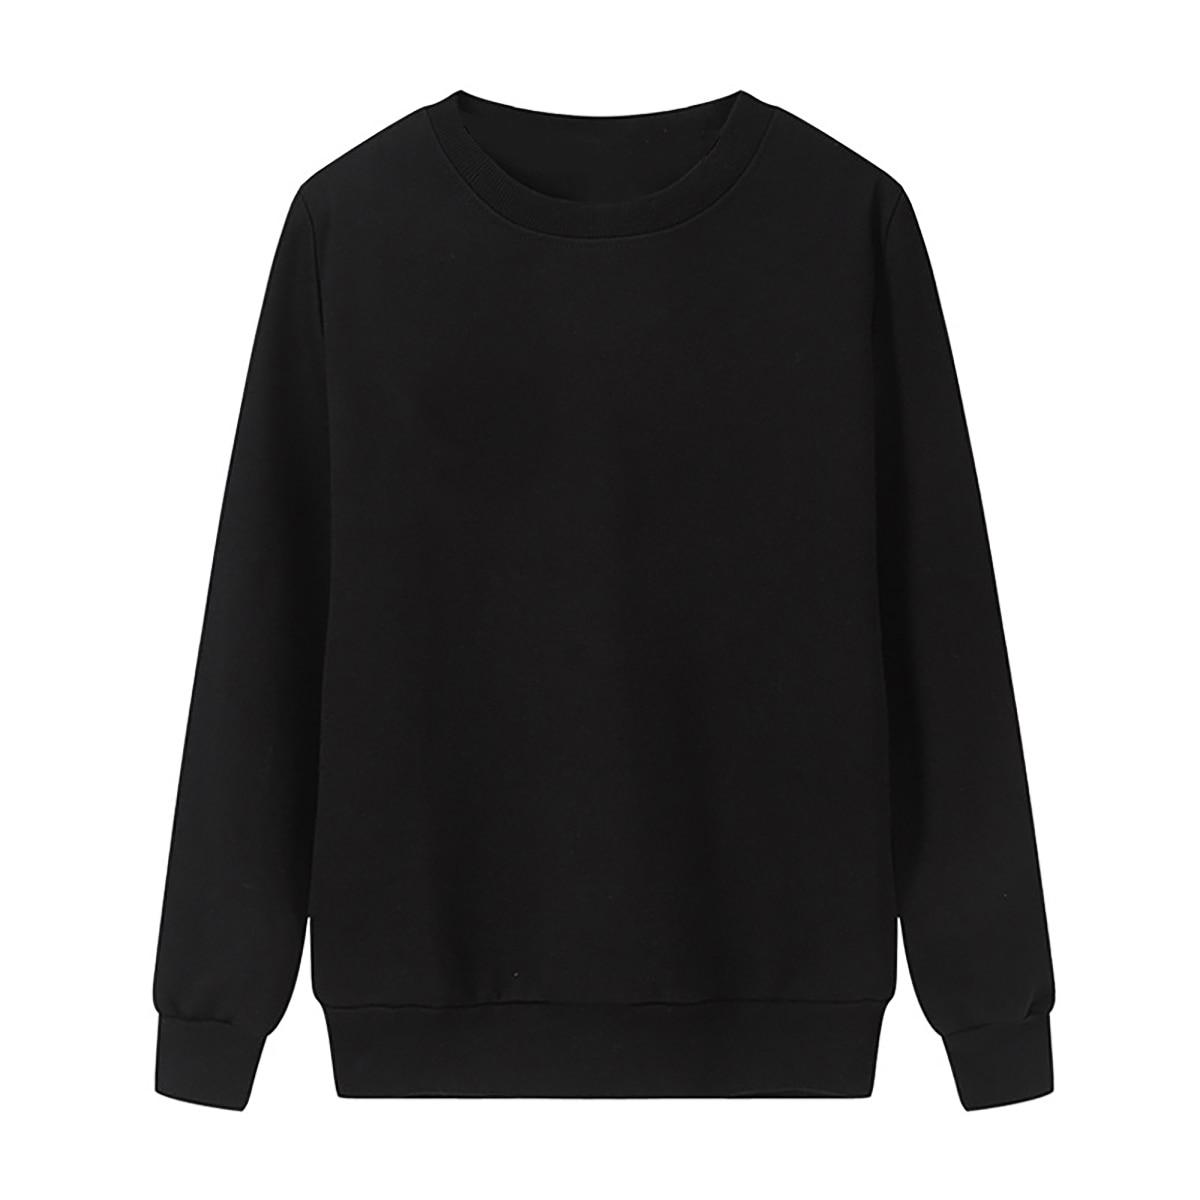 Solid Color Sweatshirt Women Casual Hoodie Fashion Winter Autumn Lasdies Pullover Fleece Black White Blue Red Gray Streetwear 7